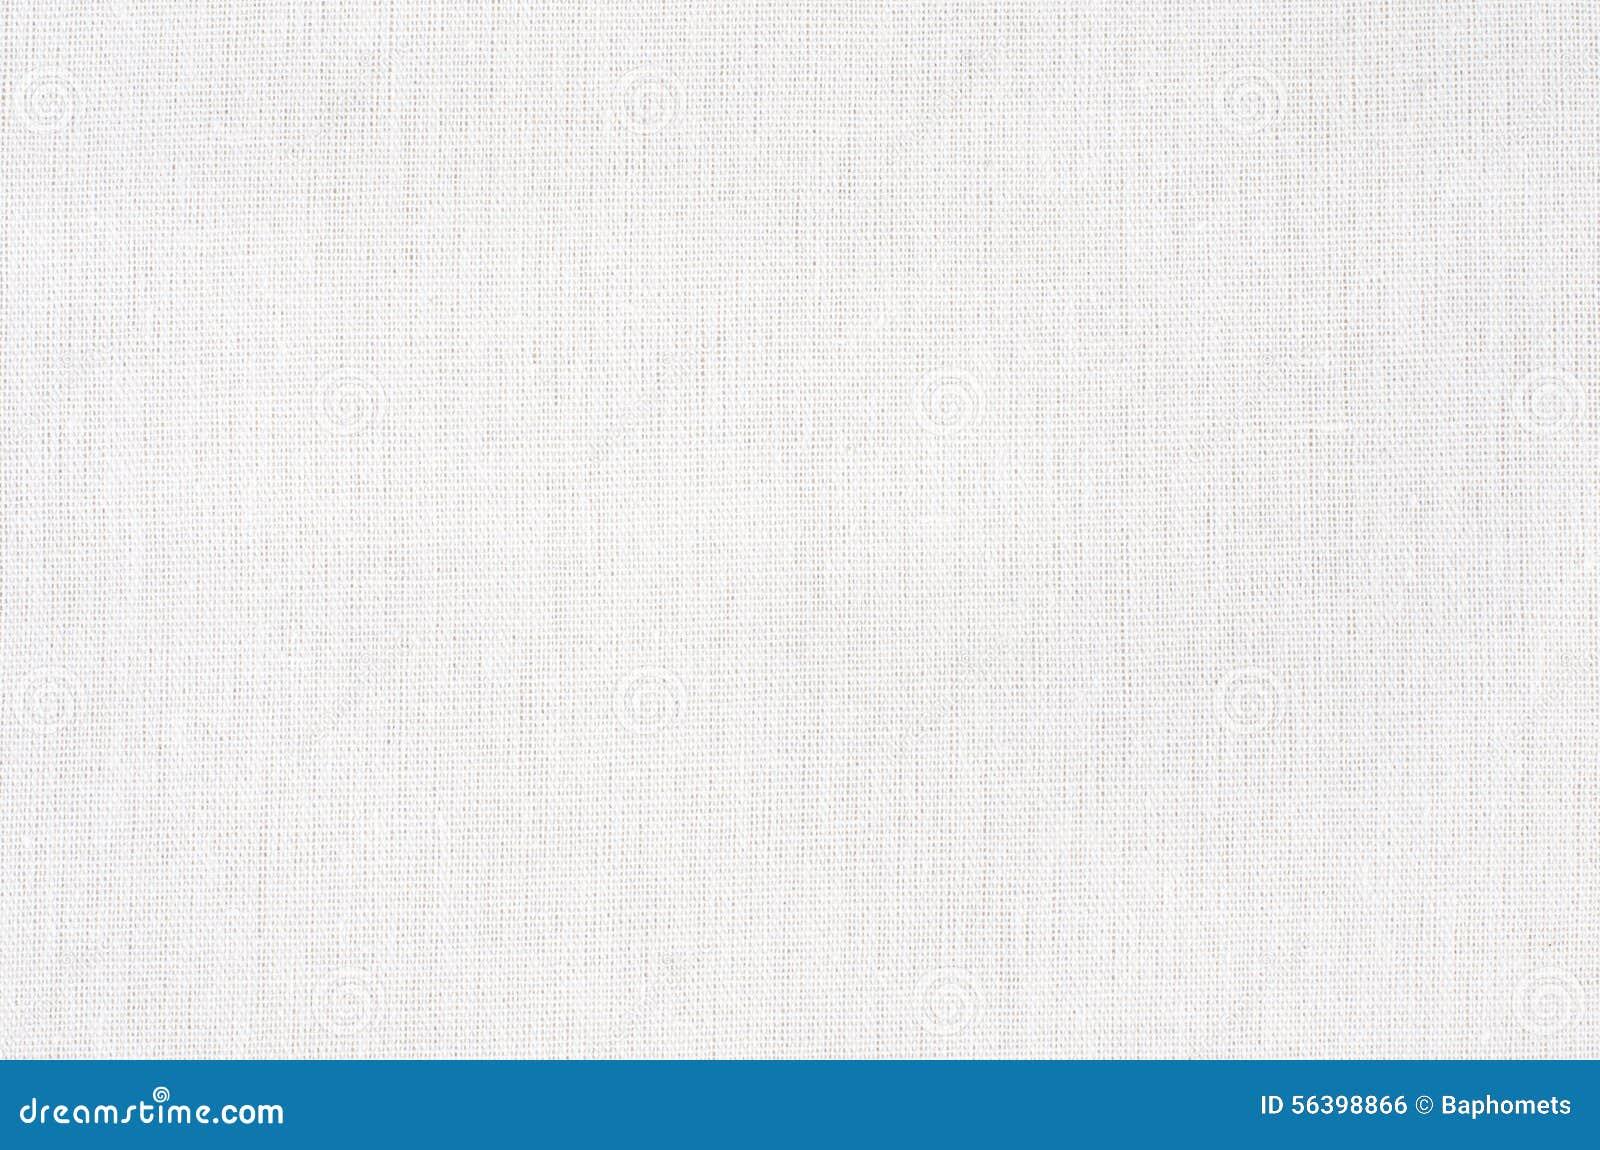 textura o fondo blanca lona blanca de la tela foto de